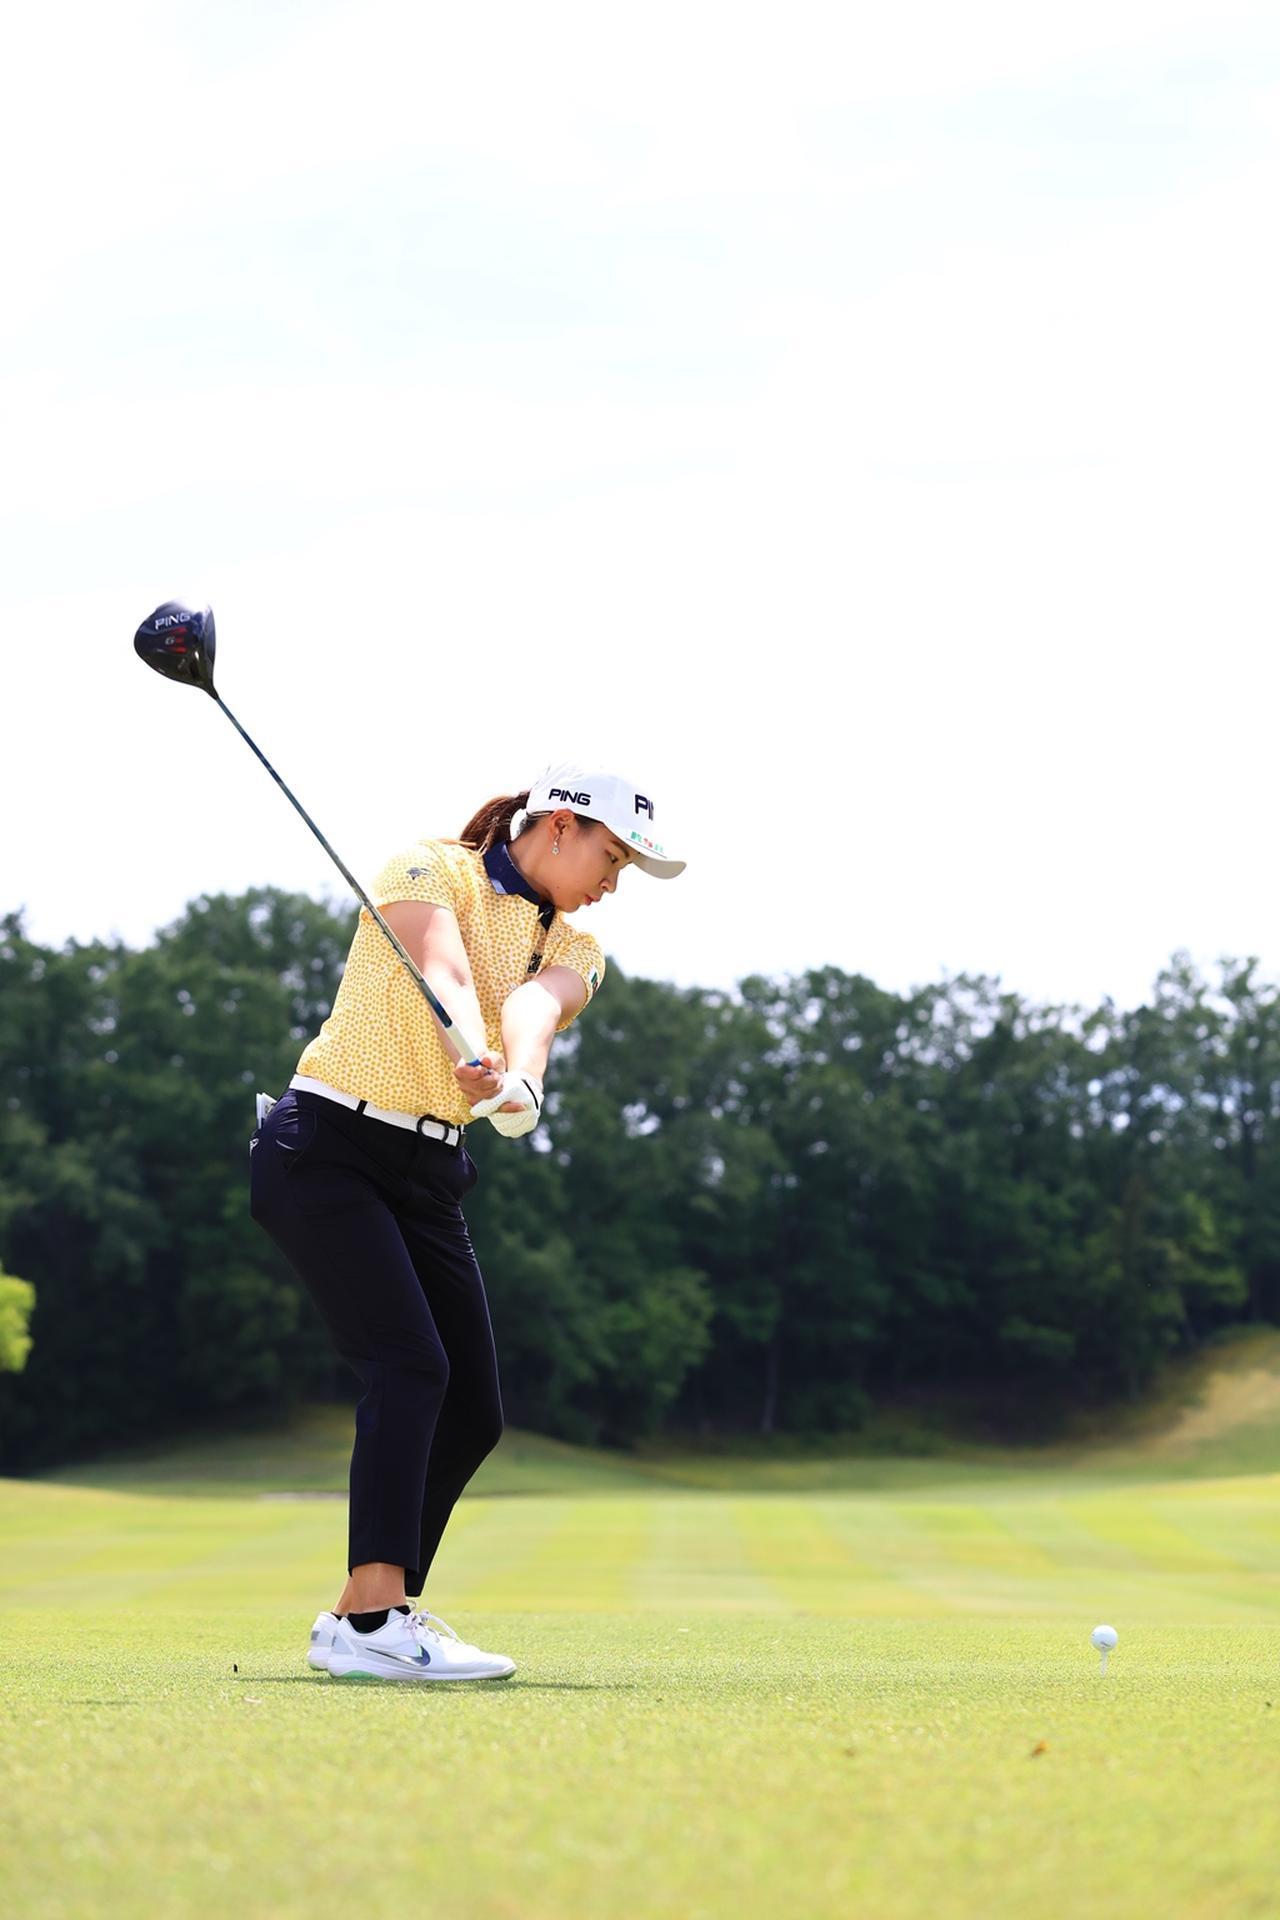 Images : 5番目の画像 - 渋野日向子のドライバー後方連続写真 - みんなのゴルフダイジェスト